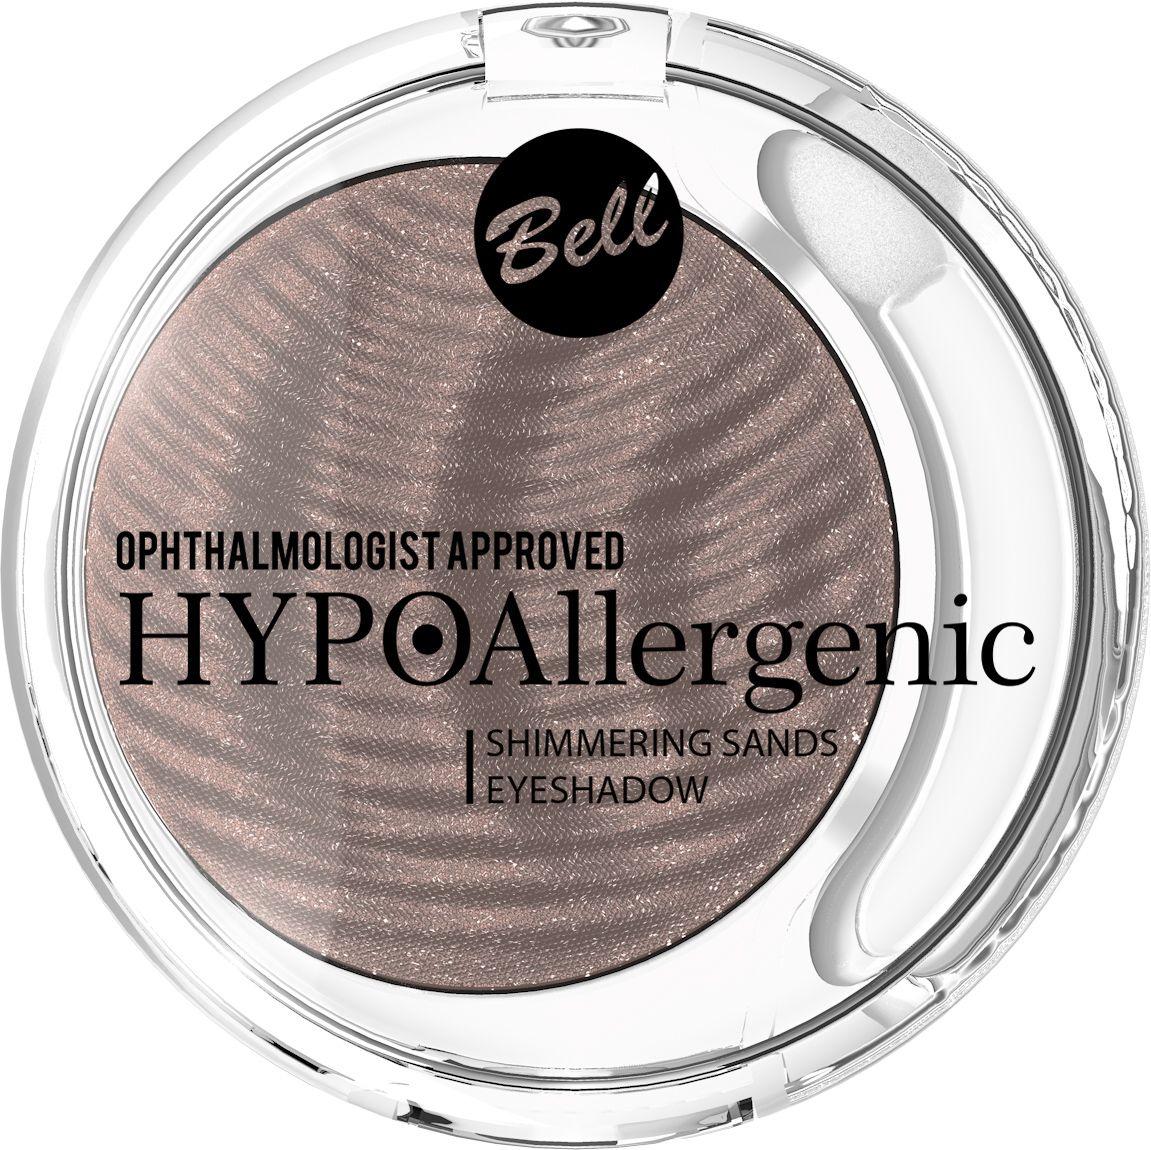 Bell Hypoallergenic Кремовые тени для век Shimmering Sands Eyeshadow, Тон №04BcssHA004